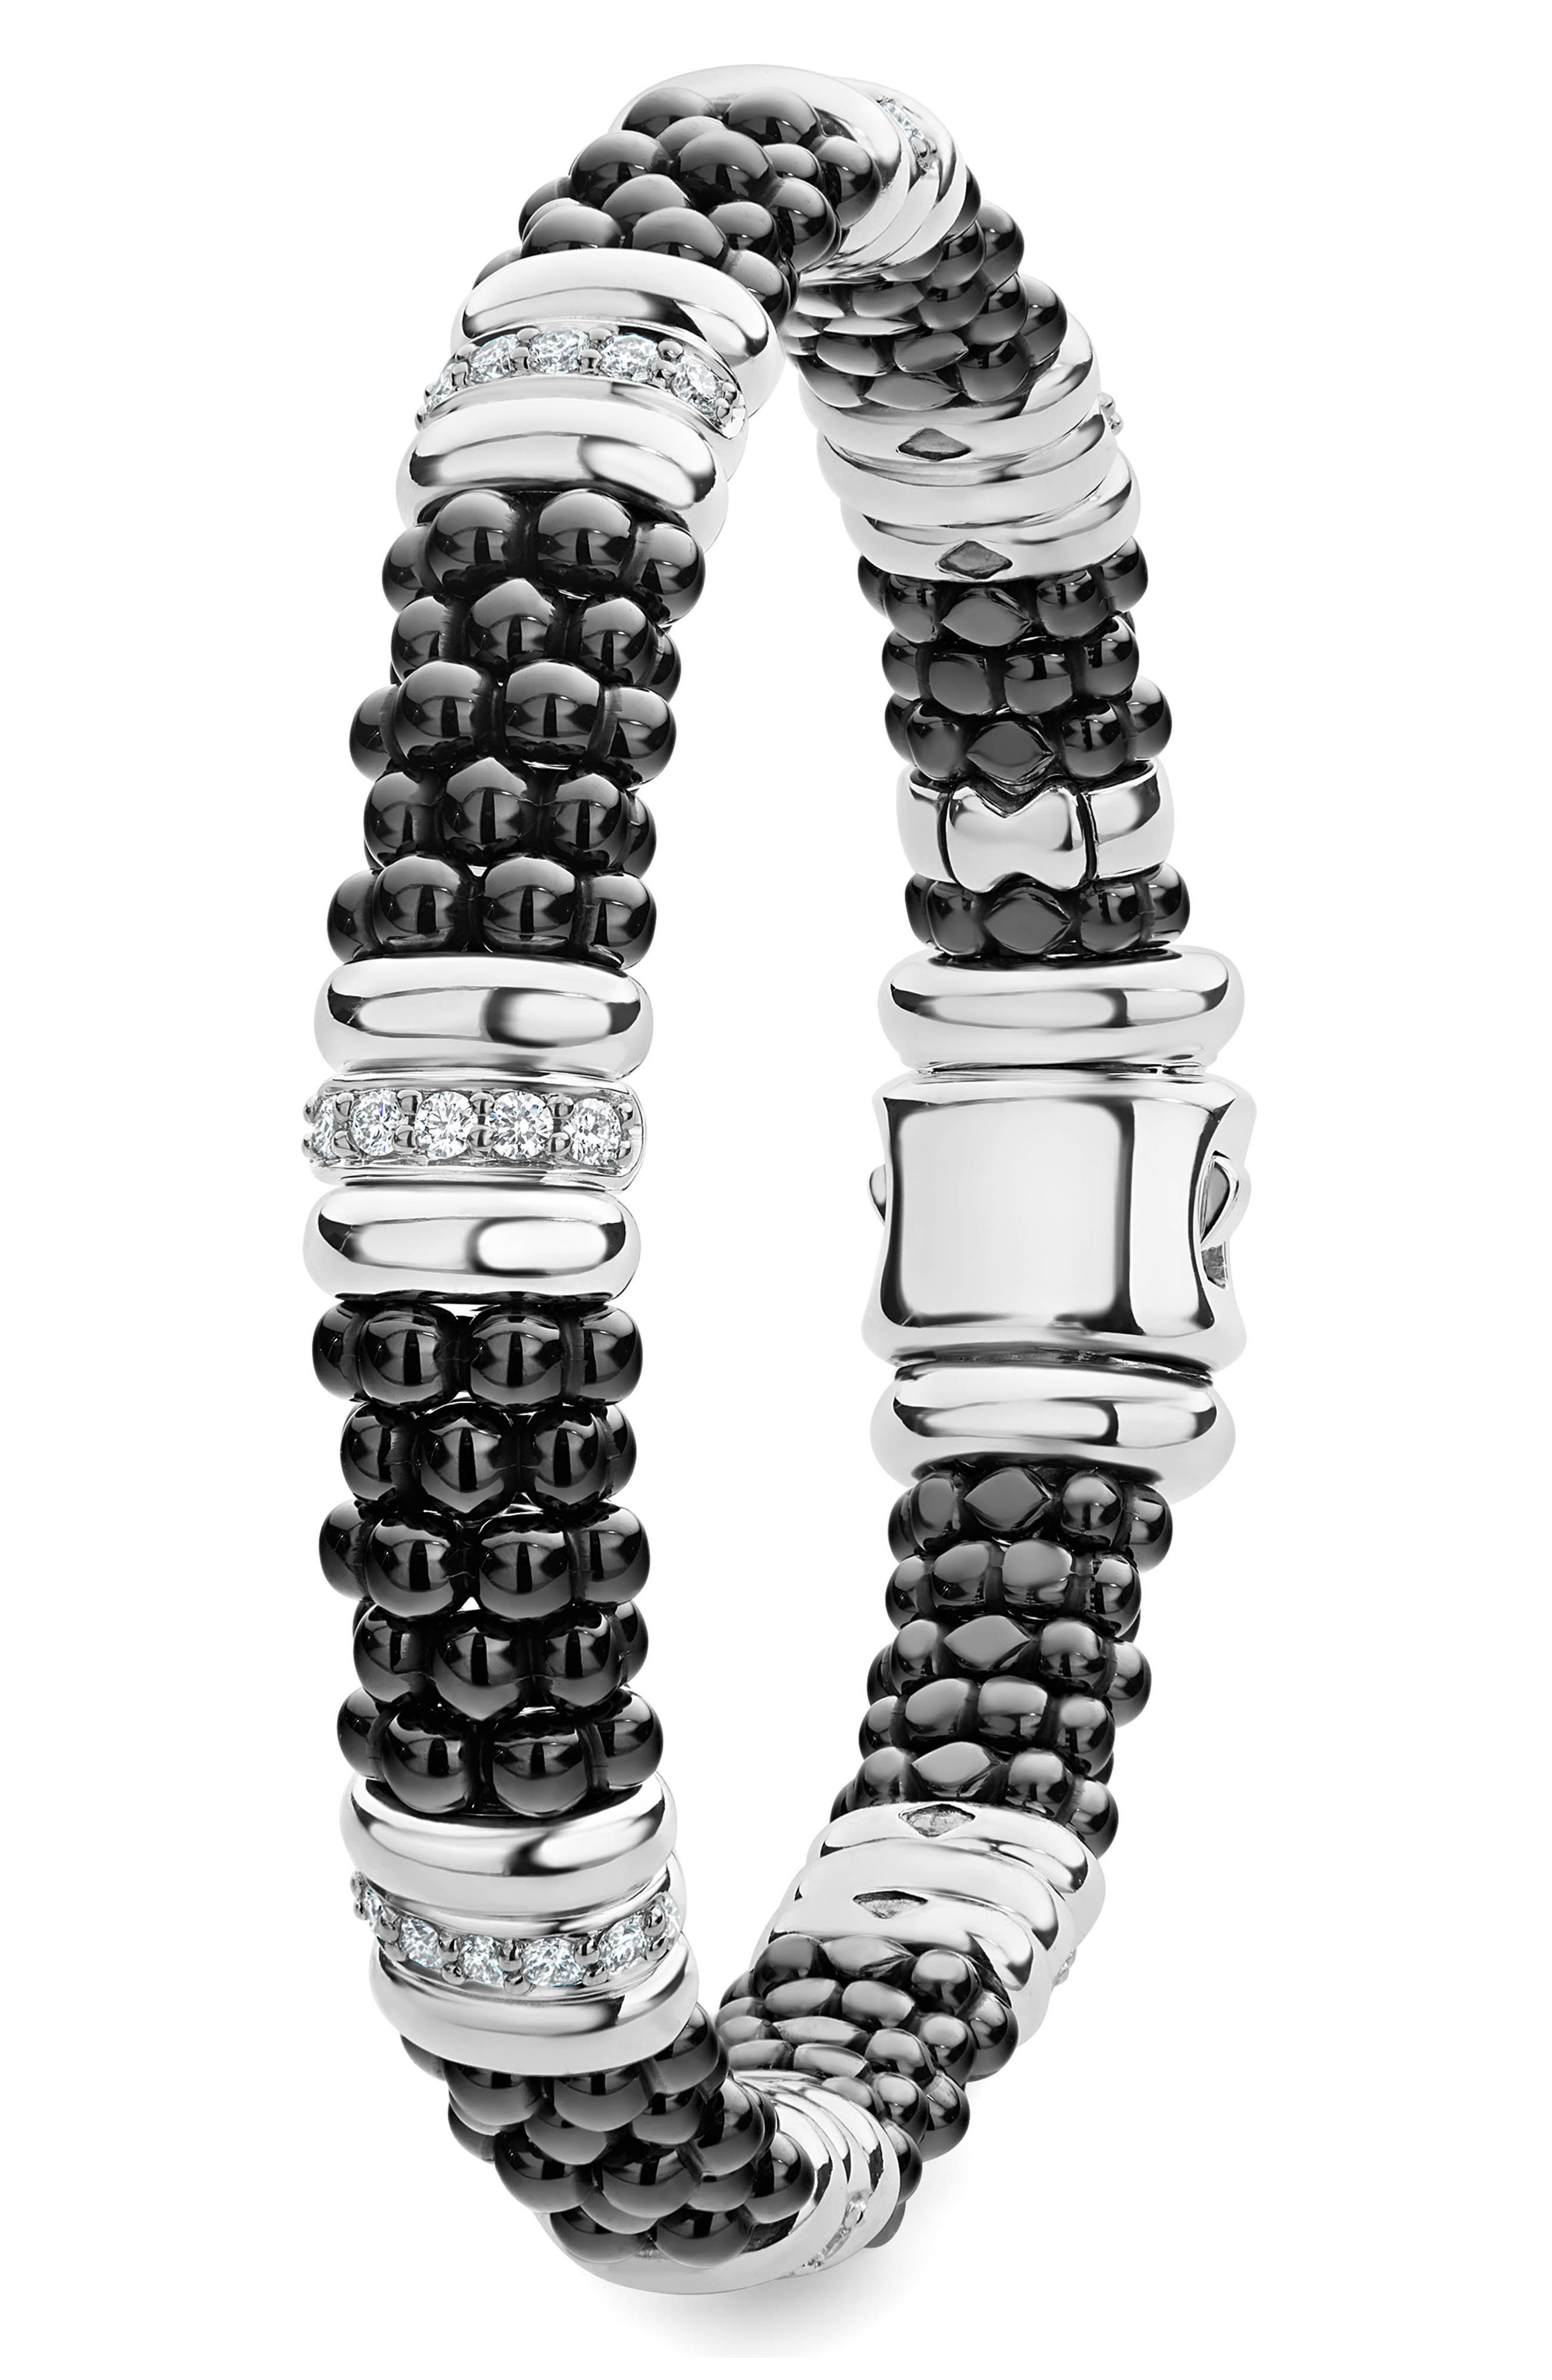 LAOGS Black Caviar Diamond 7-Link Bracelet,                             Alternate thumbnail 5, color,                             SILVER